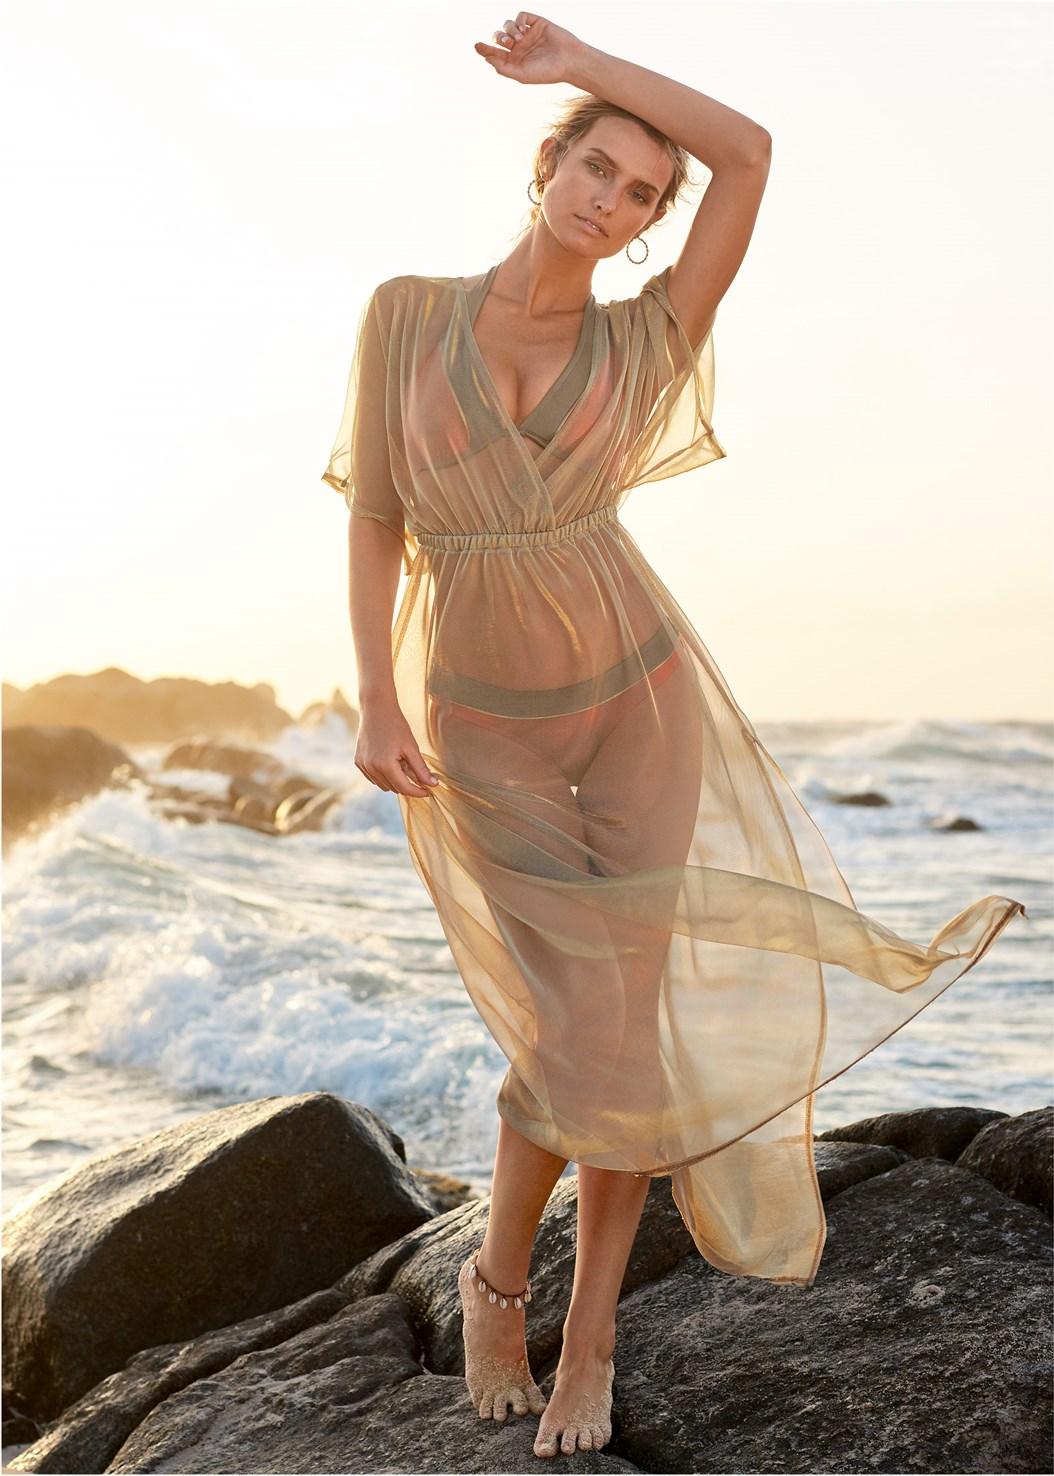 Sheer Cover-Up Dress,Underwire Halter Bikini Top,Mid Rise Bikini Bottom